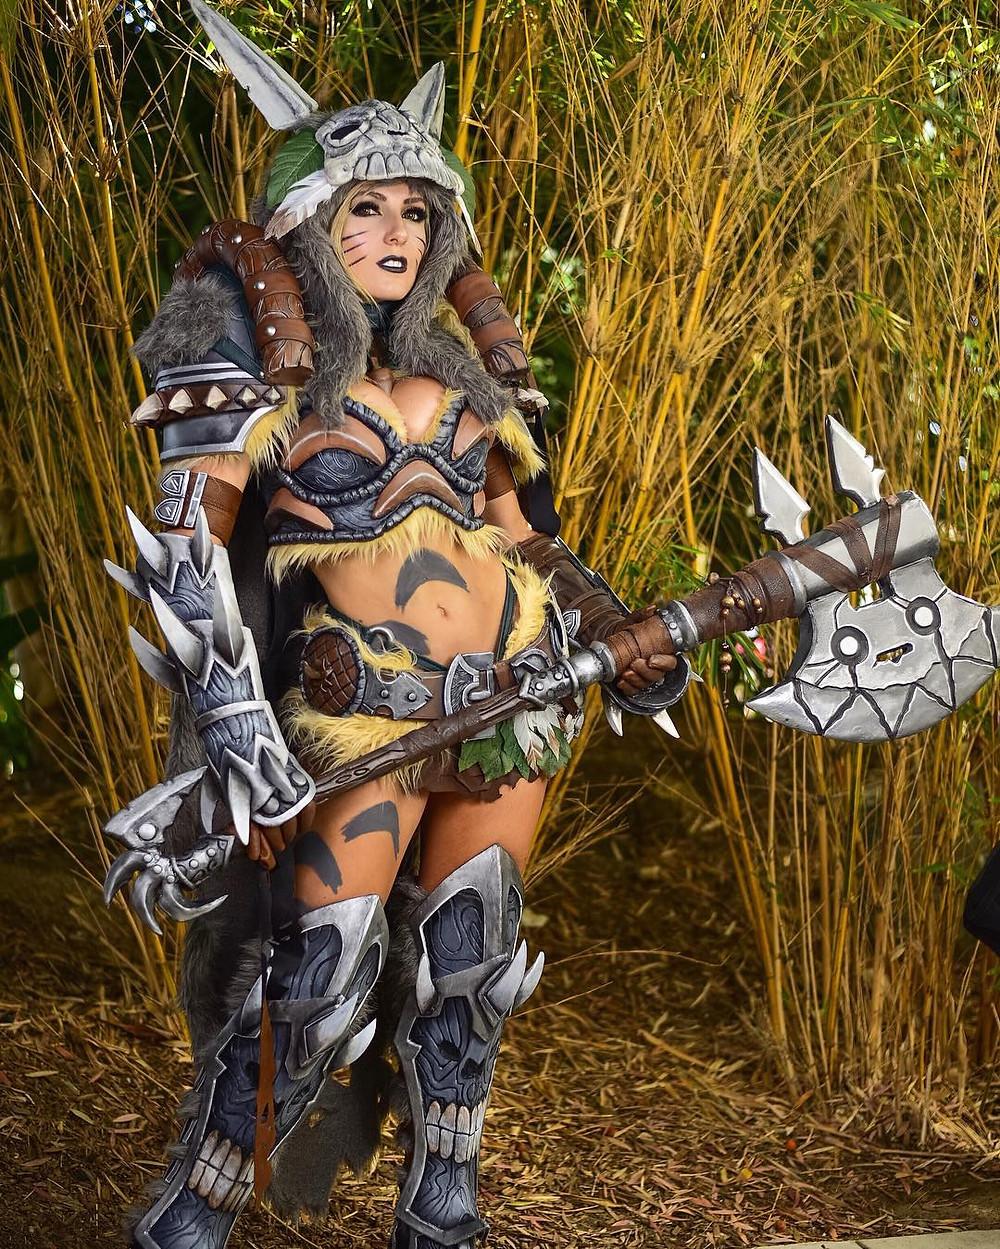 Jessica Nigri Necromancer totoro cosplay comic con 2016 Socially Gaming